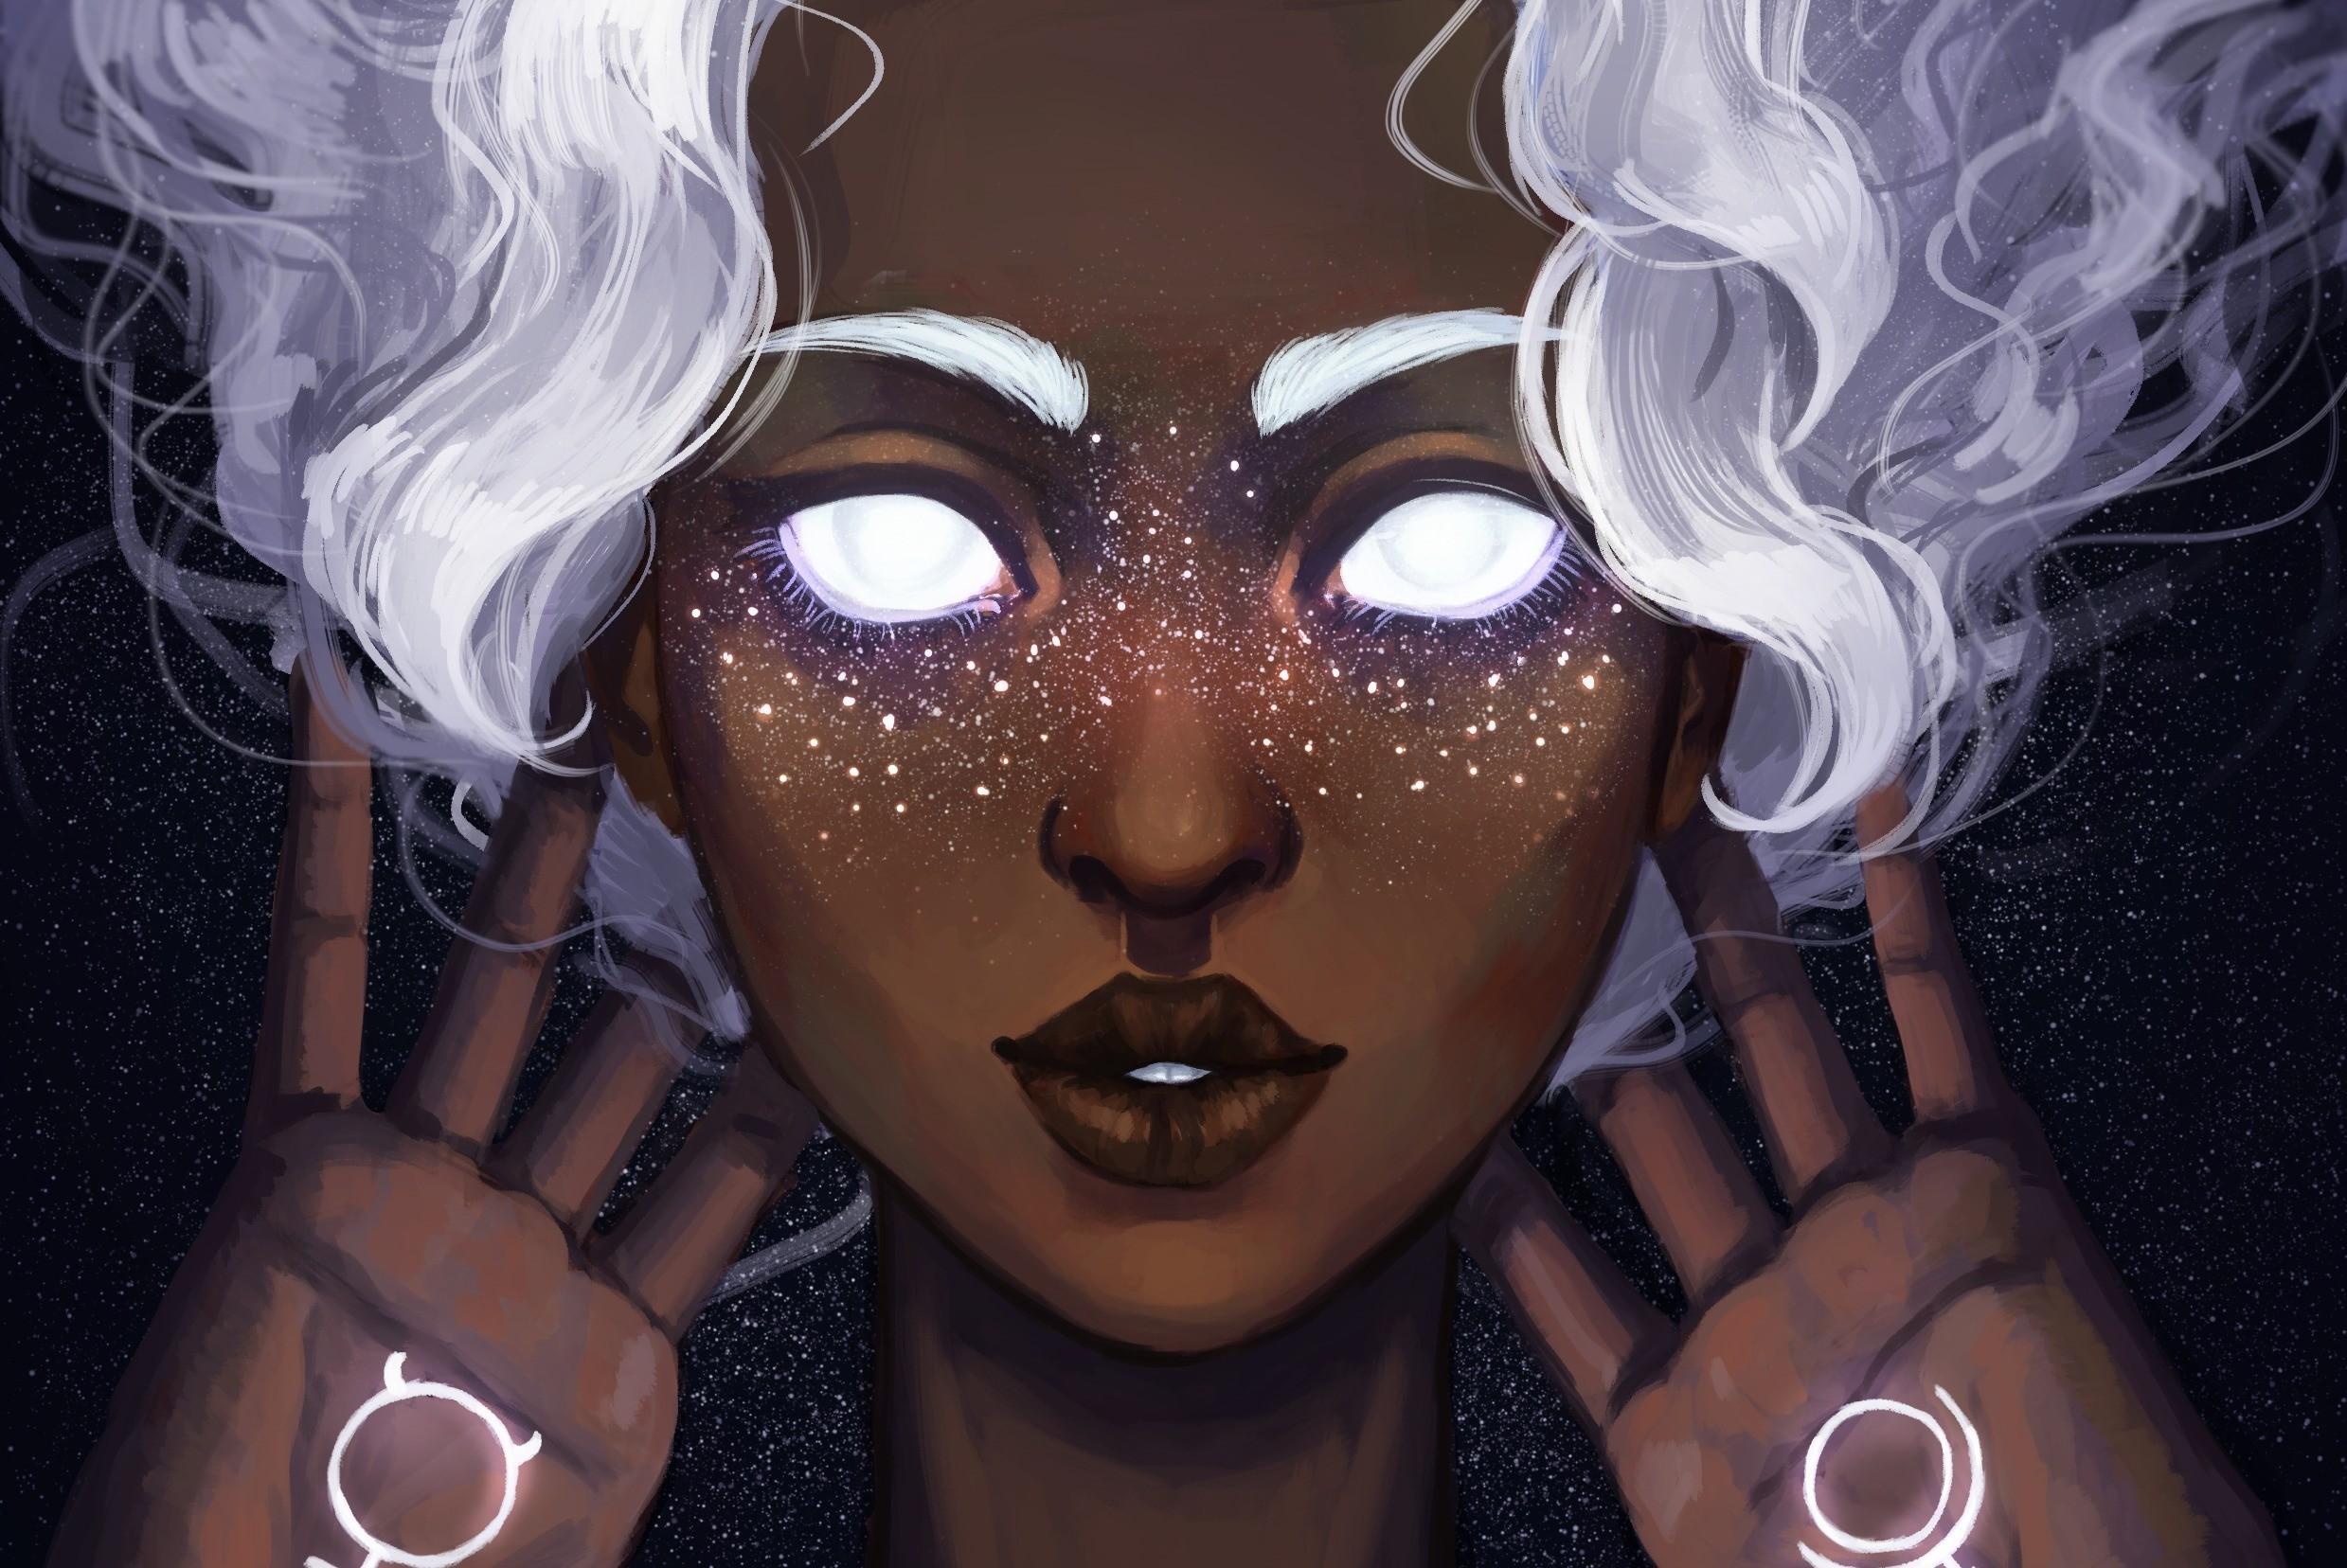 General 2478x1656 fantasy art artwork glowing eyes face fantasy girl